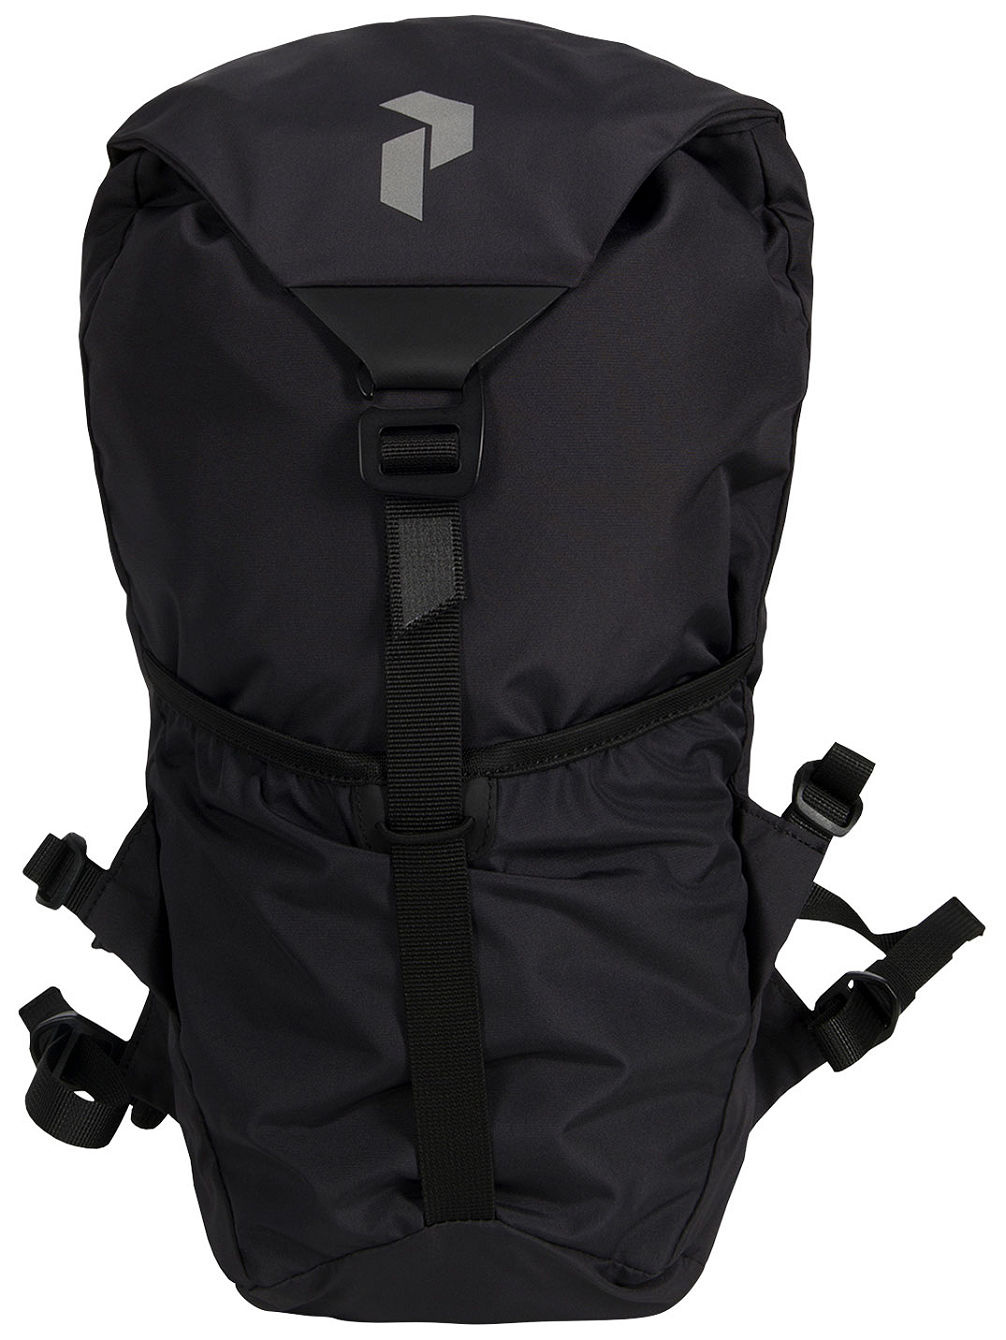 19eac1ac5d91 Japan Adidas Originals 3d Mesh Roll Up Backpack- Fenix Toulouse Handball